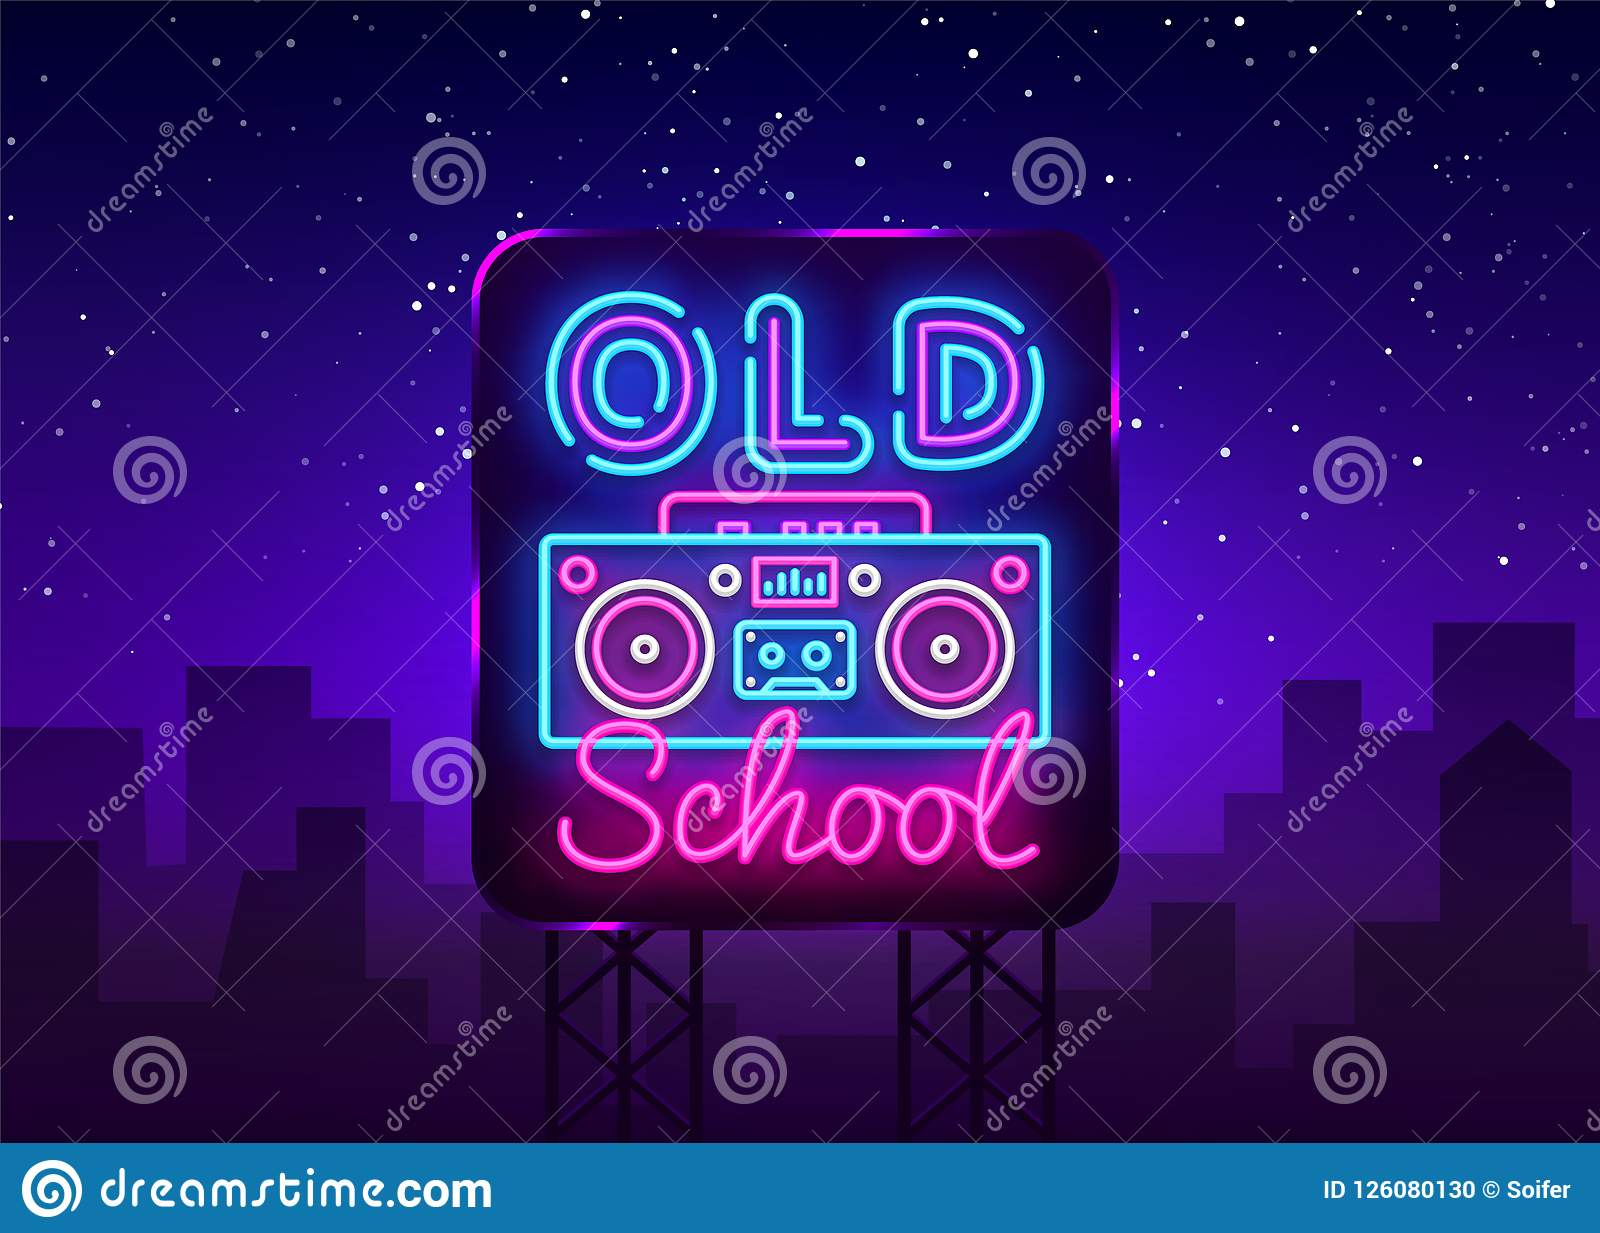 Old School Neon Sign Vector  Retro Music Design Template Neon Sign